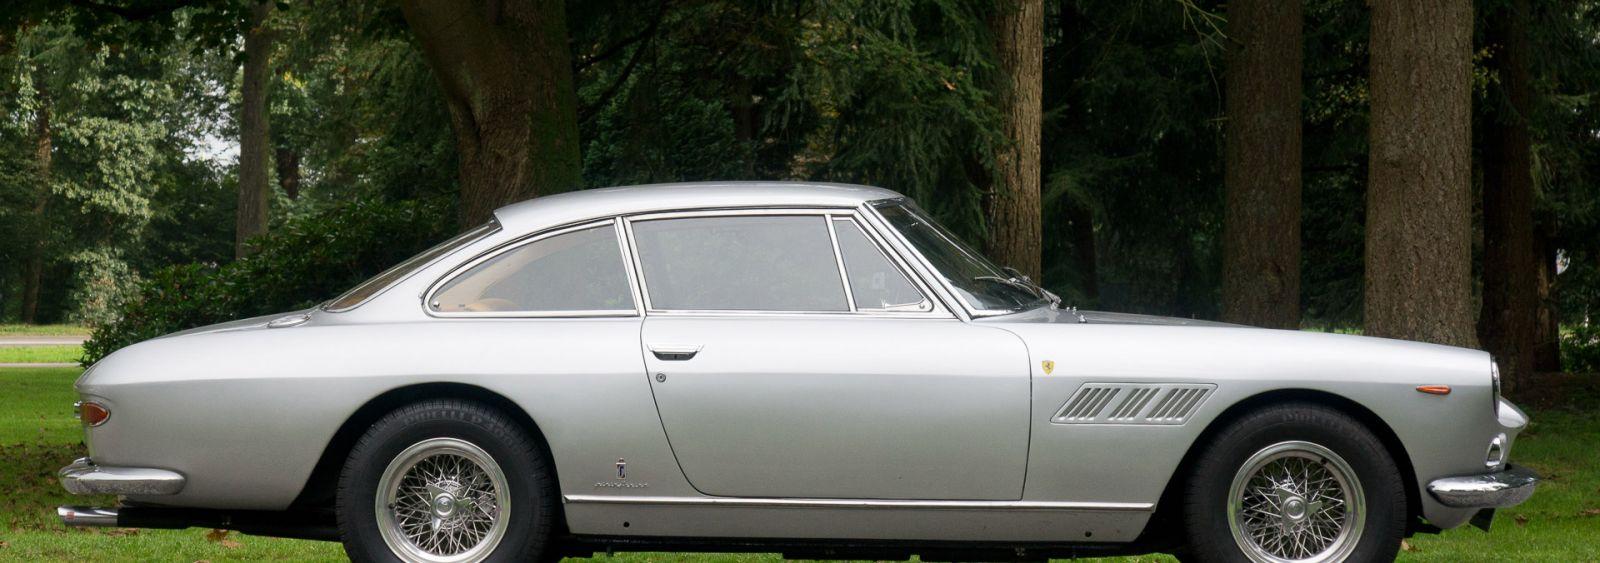 Ferrari 330 Gt 2 2 Series 1 1964 Classicargarage De